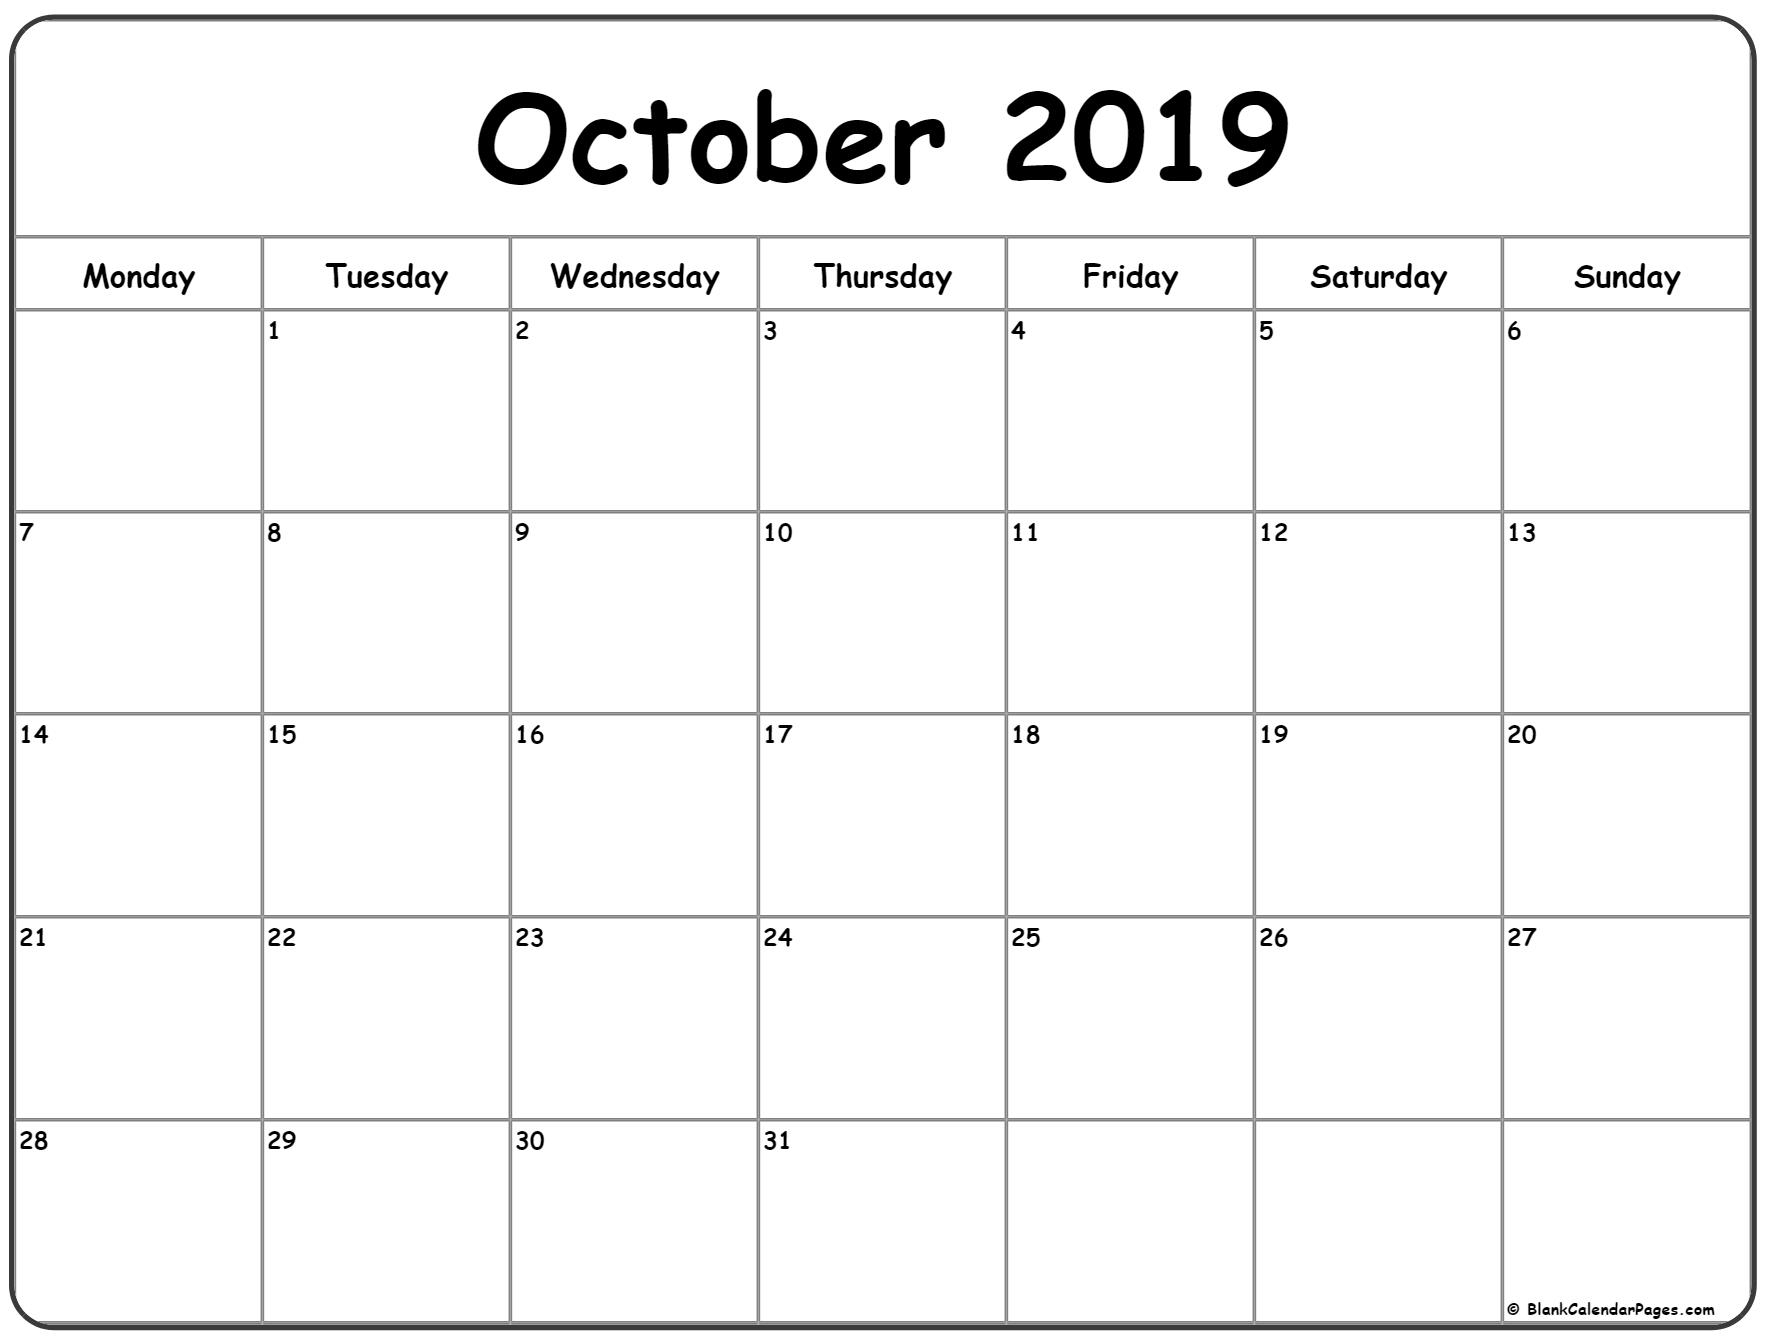 October 2019 Monday Calendar   Monday To Sunday